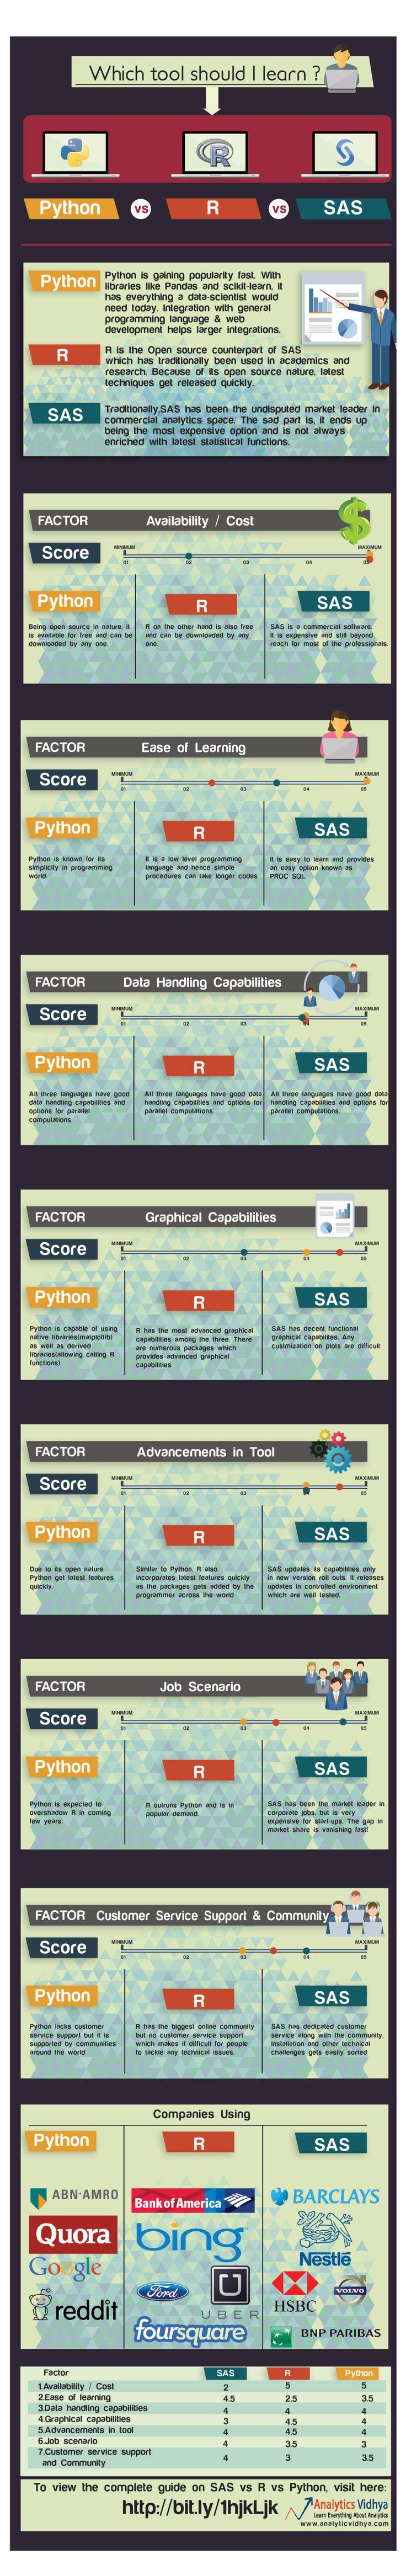 INFOGRAPHIC: Quick Guide on SAS vs R vs Python | bicorner.com